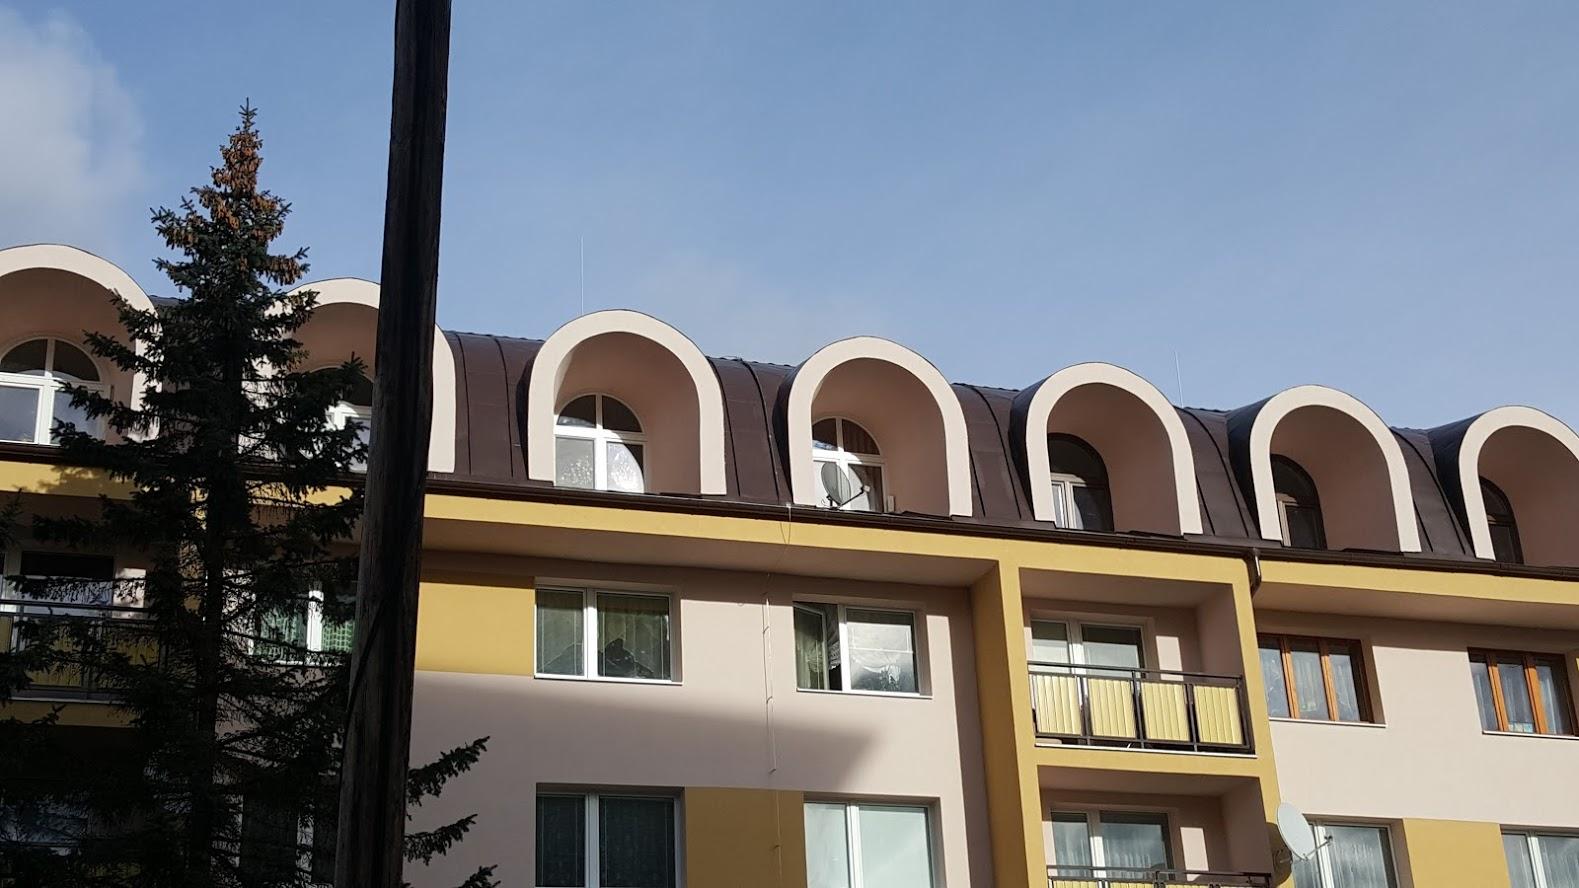 Soter-Dach (30)